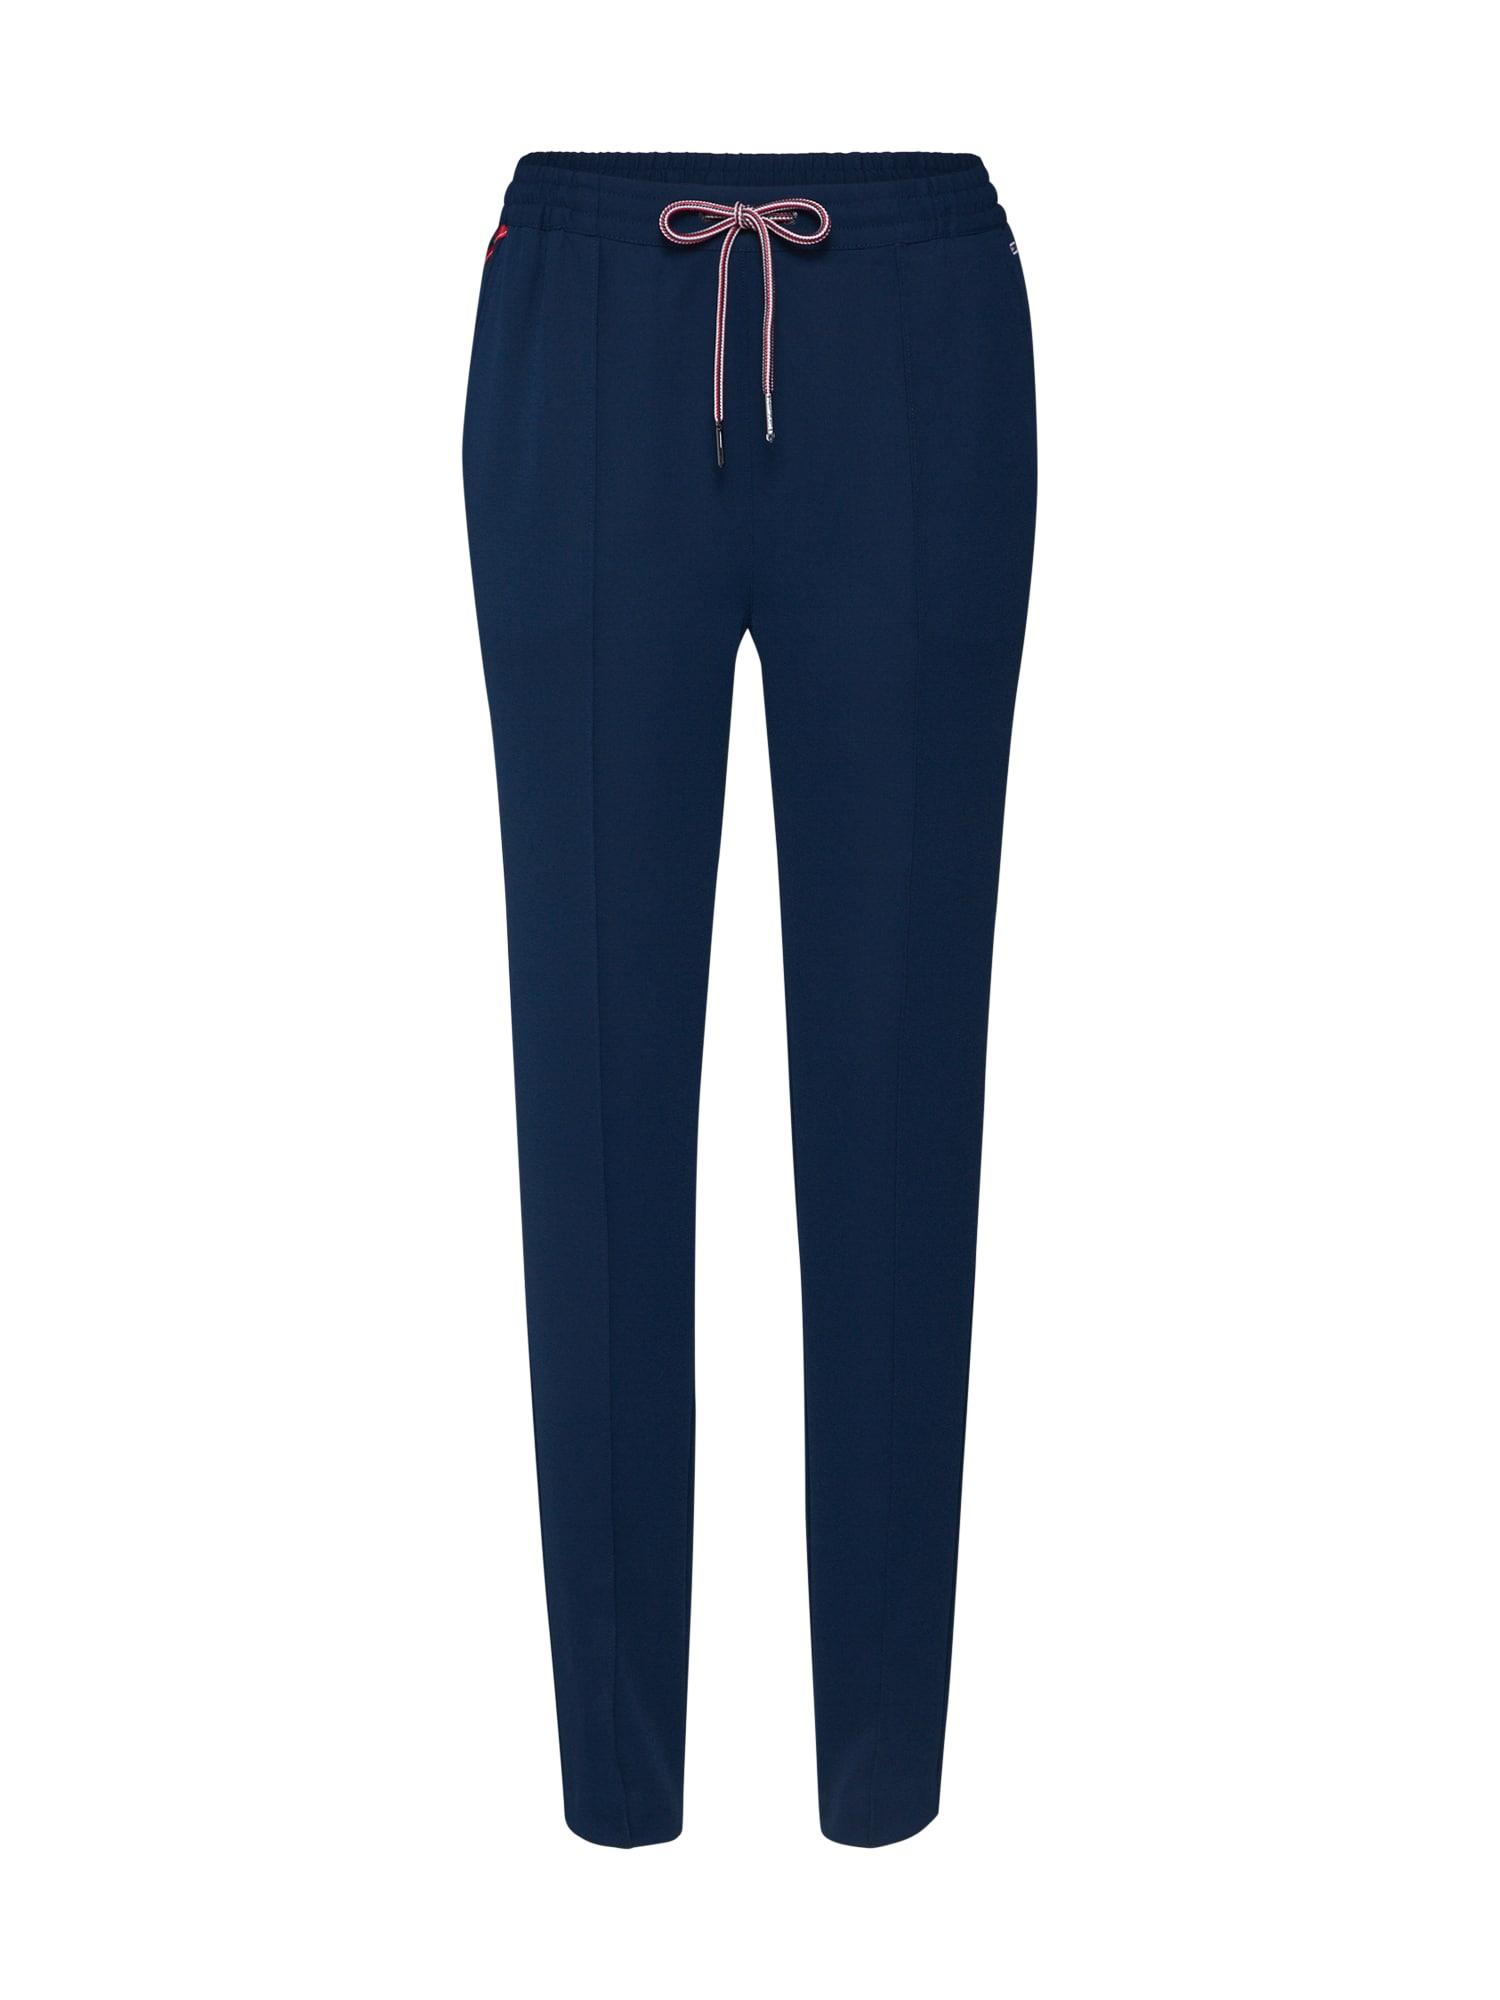 Tommy Jeans Pižaminės kelnės 'TJW SMART JOGGER' tamsiai mėlyna